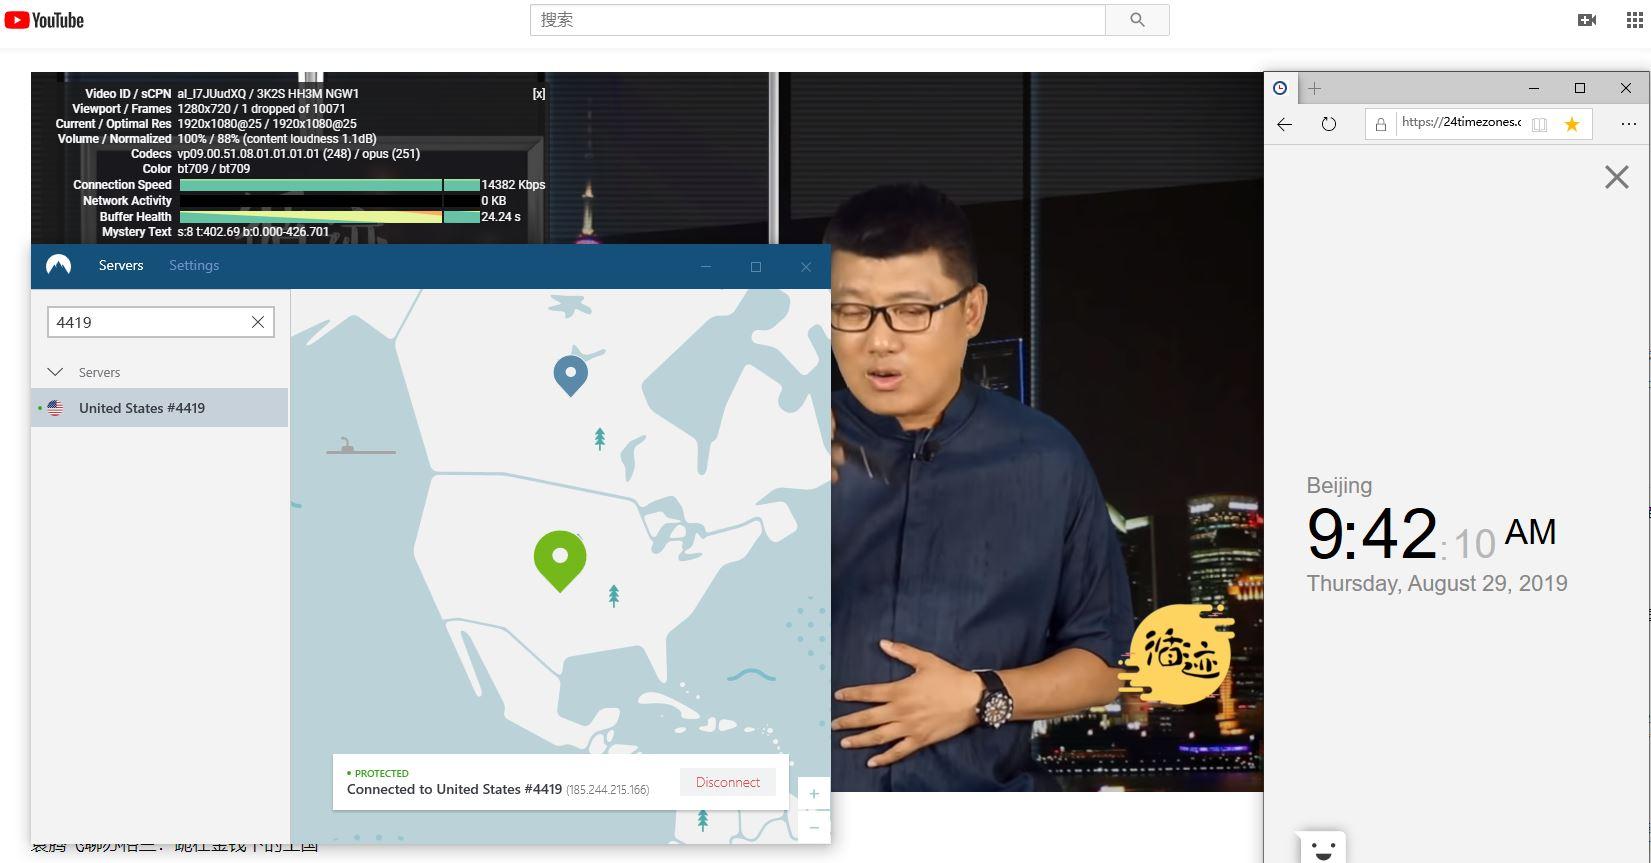 nordvpn windows 美国4419服务器 中国翻墙 科学上网 YouTube测速3-20190829